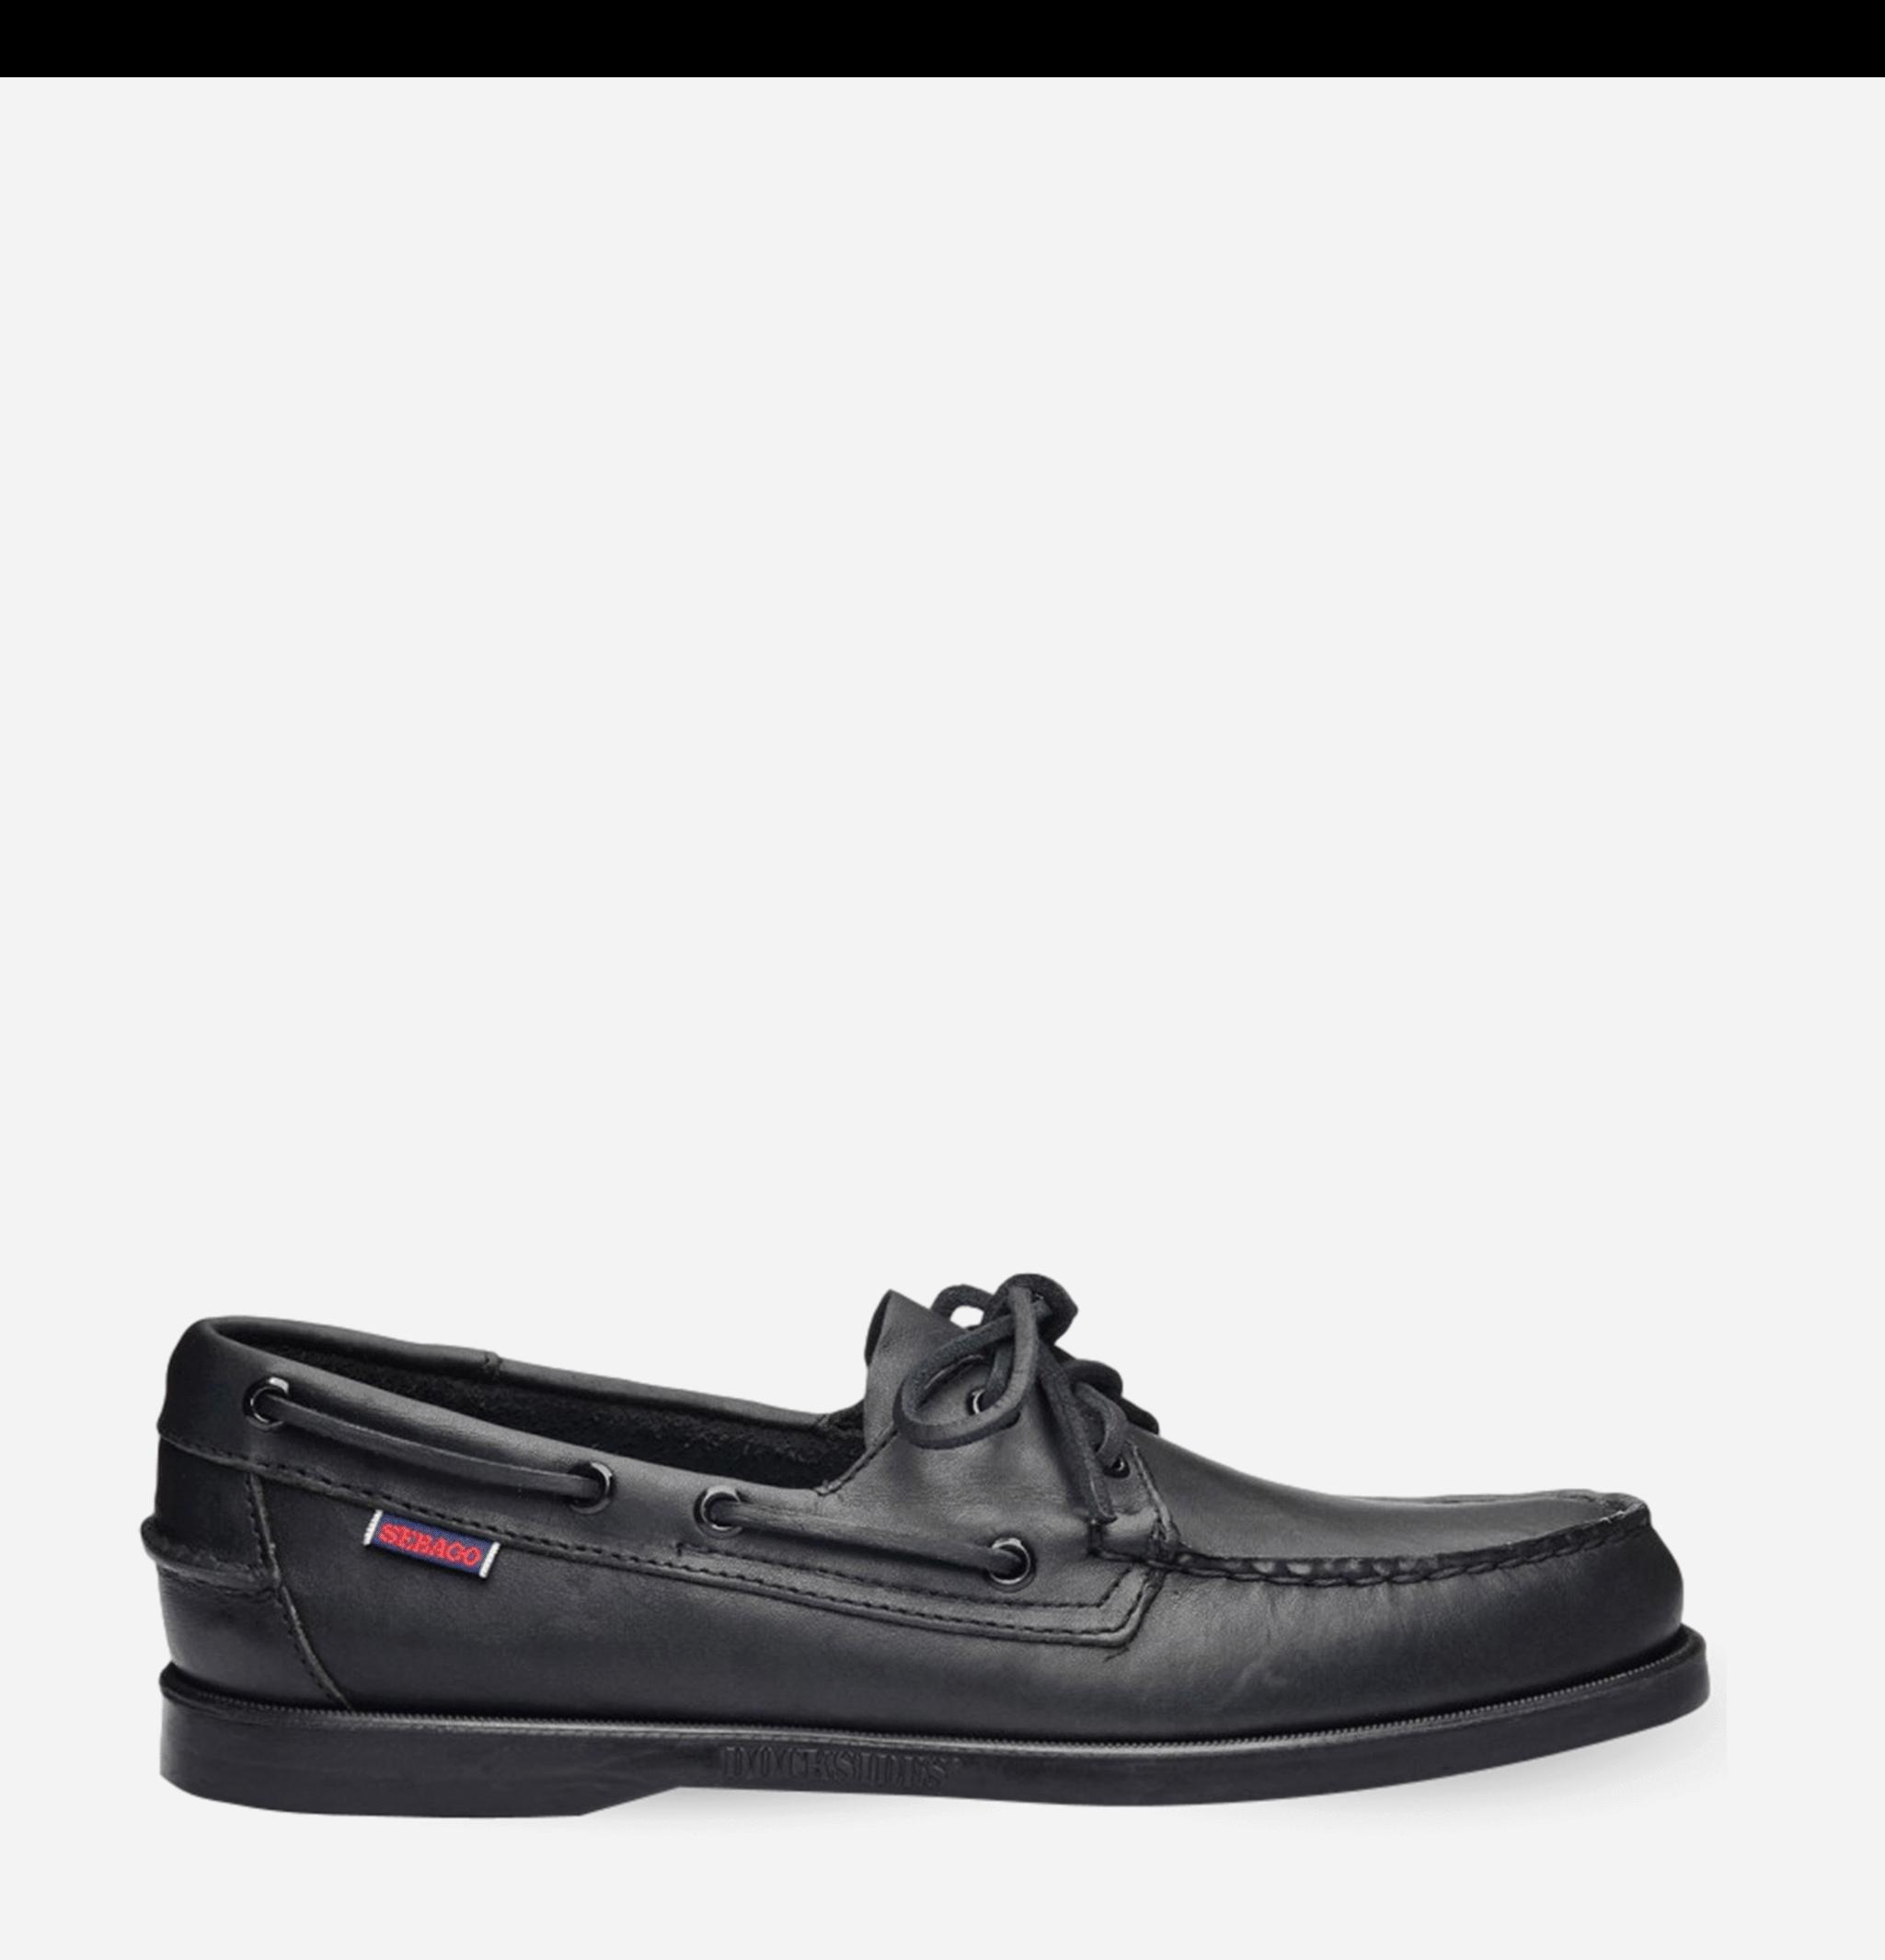 Chaussures Docksides Black